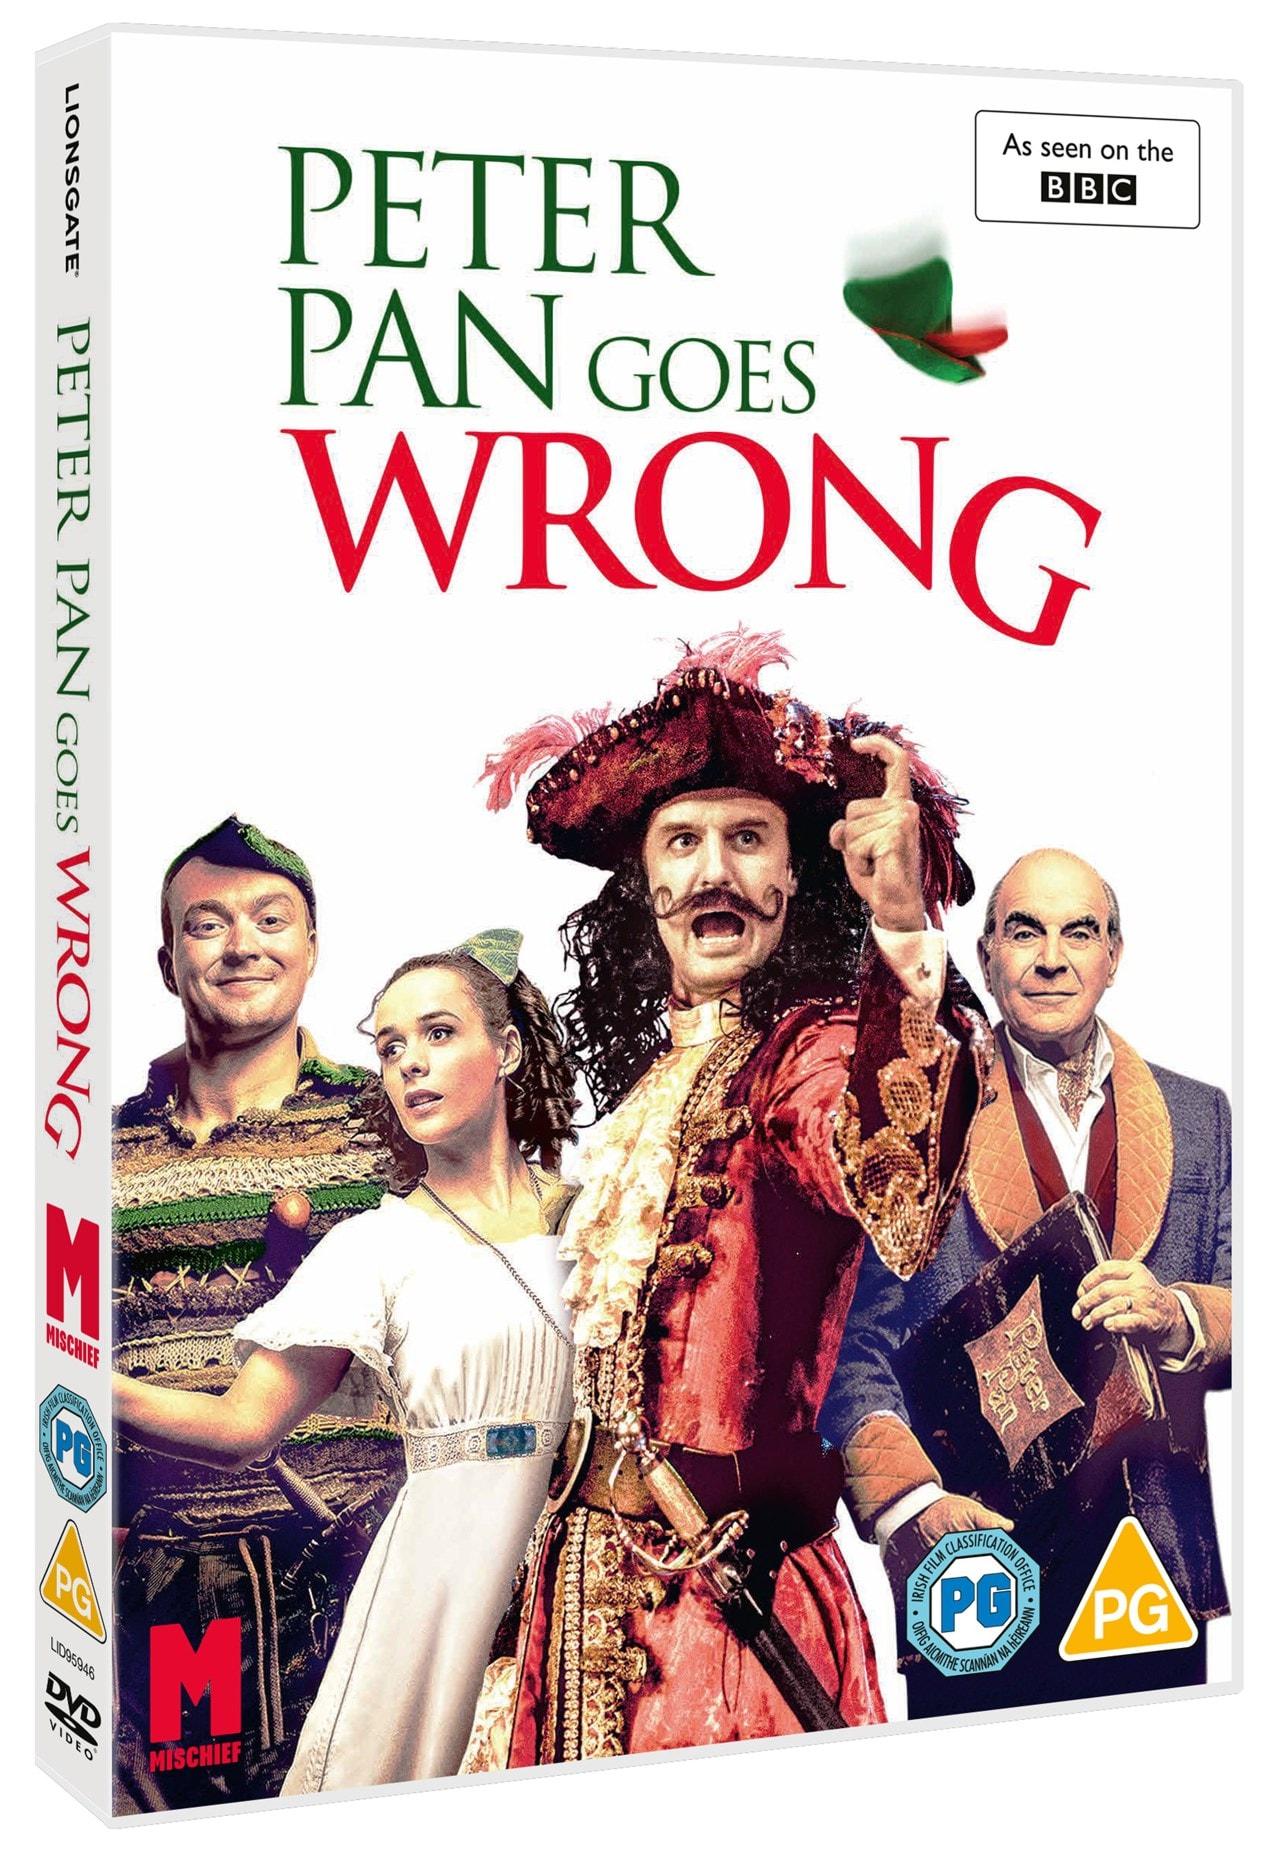 Peter Pan Goes Wrong - 2